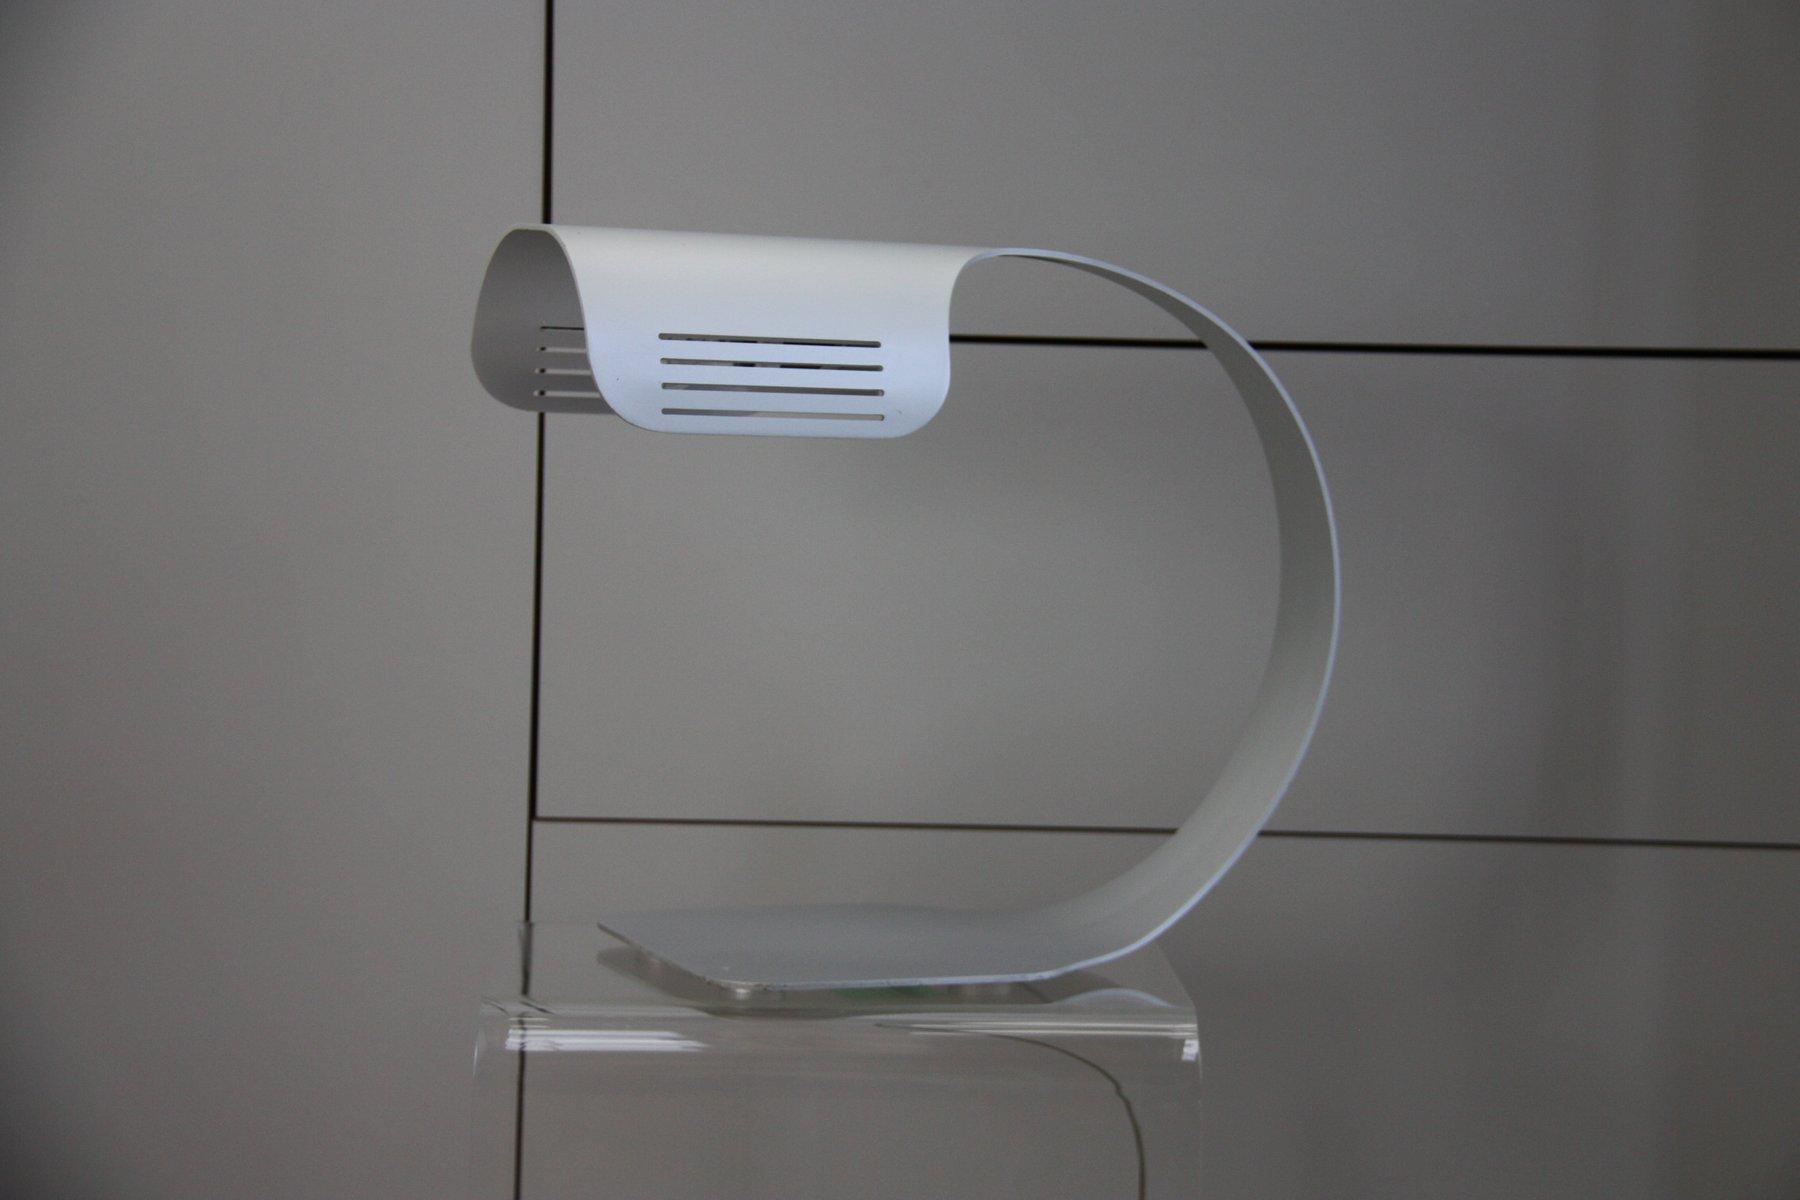 Lampe de bureau vintage en aluminium brossé par walter moretti